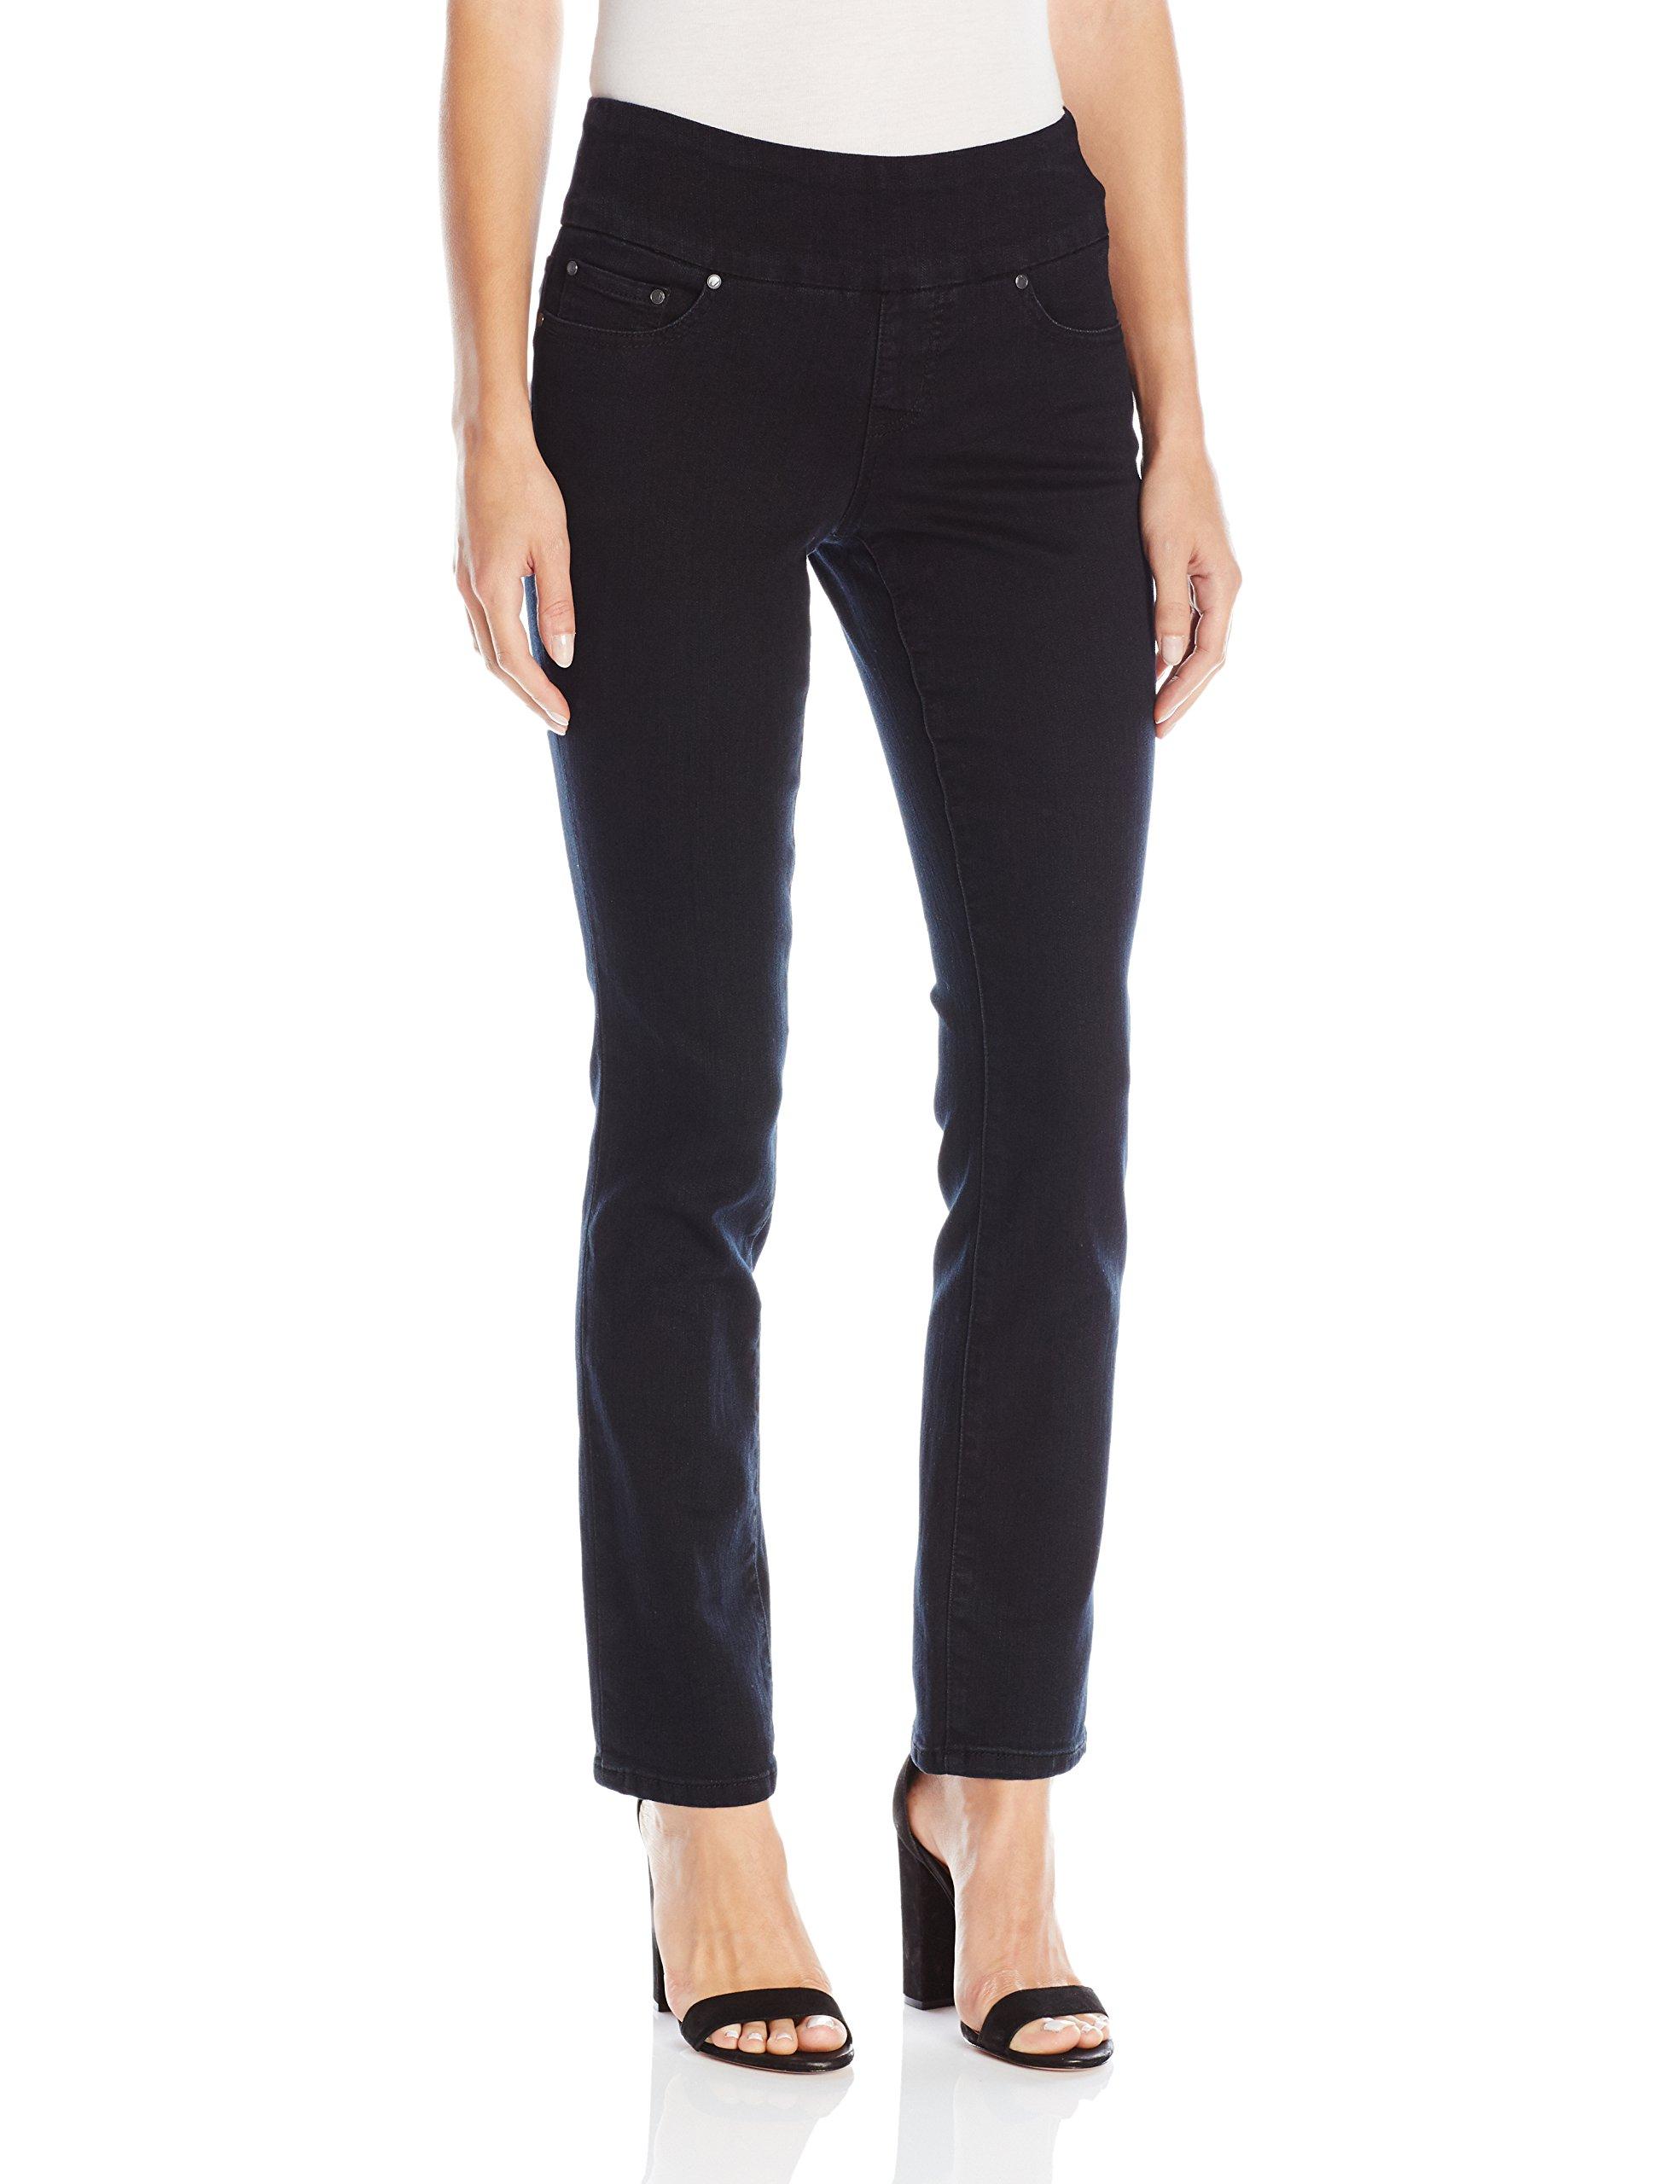 Jag Jeans Women's Petite Peri Straight Pull on